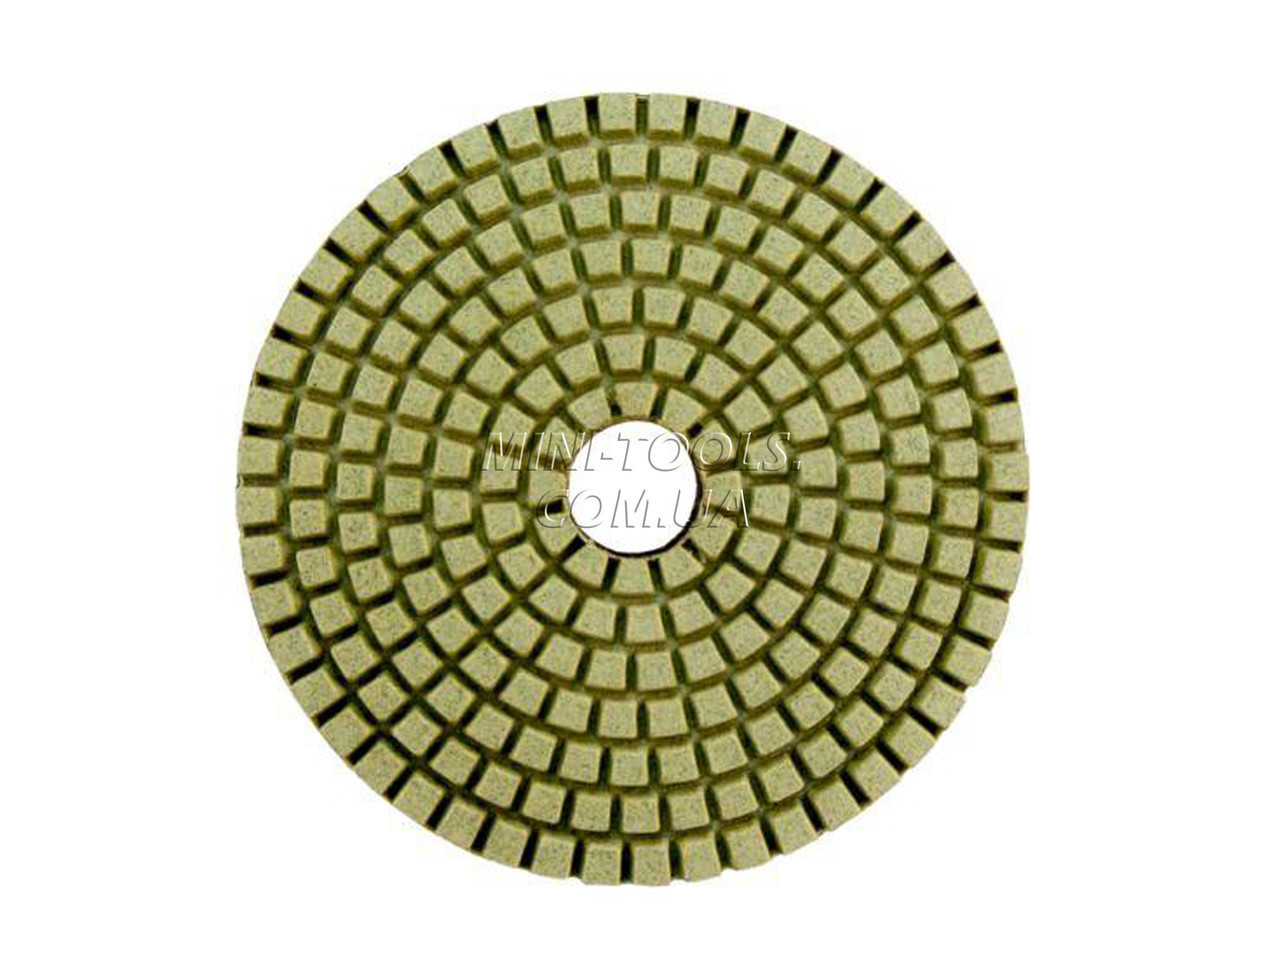 Черепашка D-100мм. зерно #800. Алмазний гнучкий шліфувальний круг YDS Tools